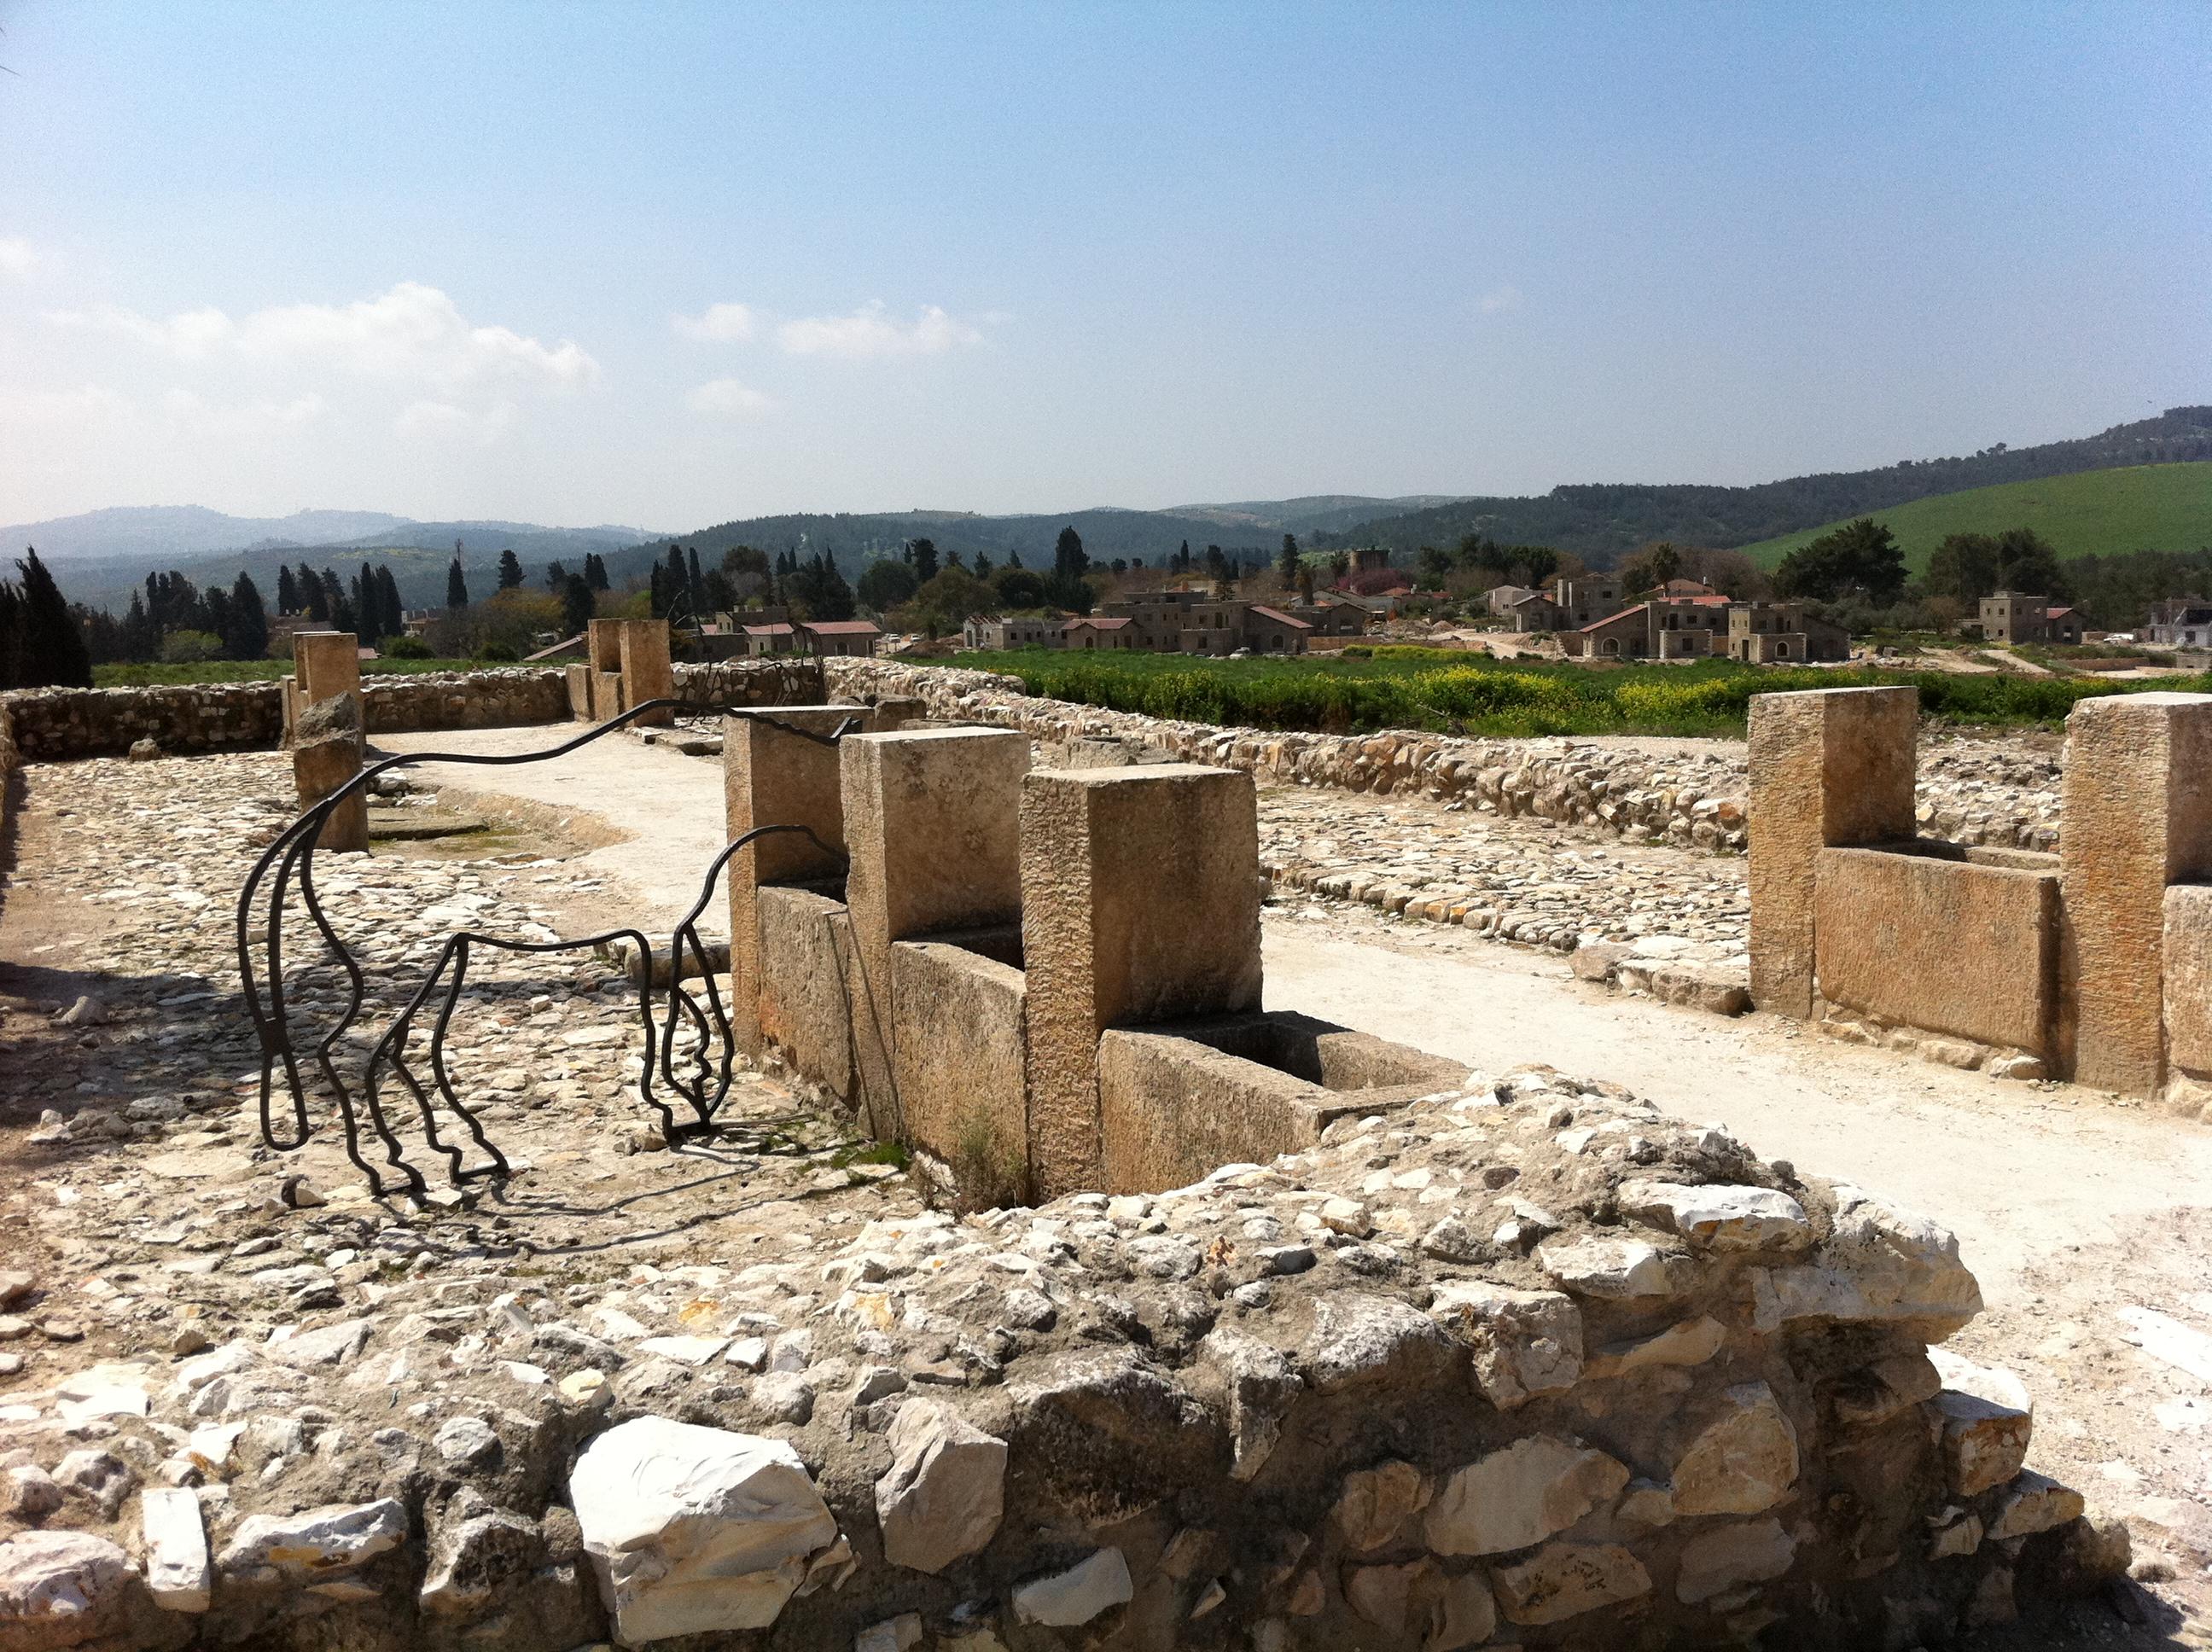 Tel Megiddo solomon horse, israel에 대한 이미지 검색결과